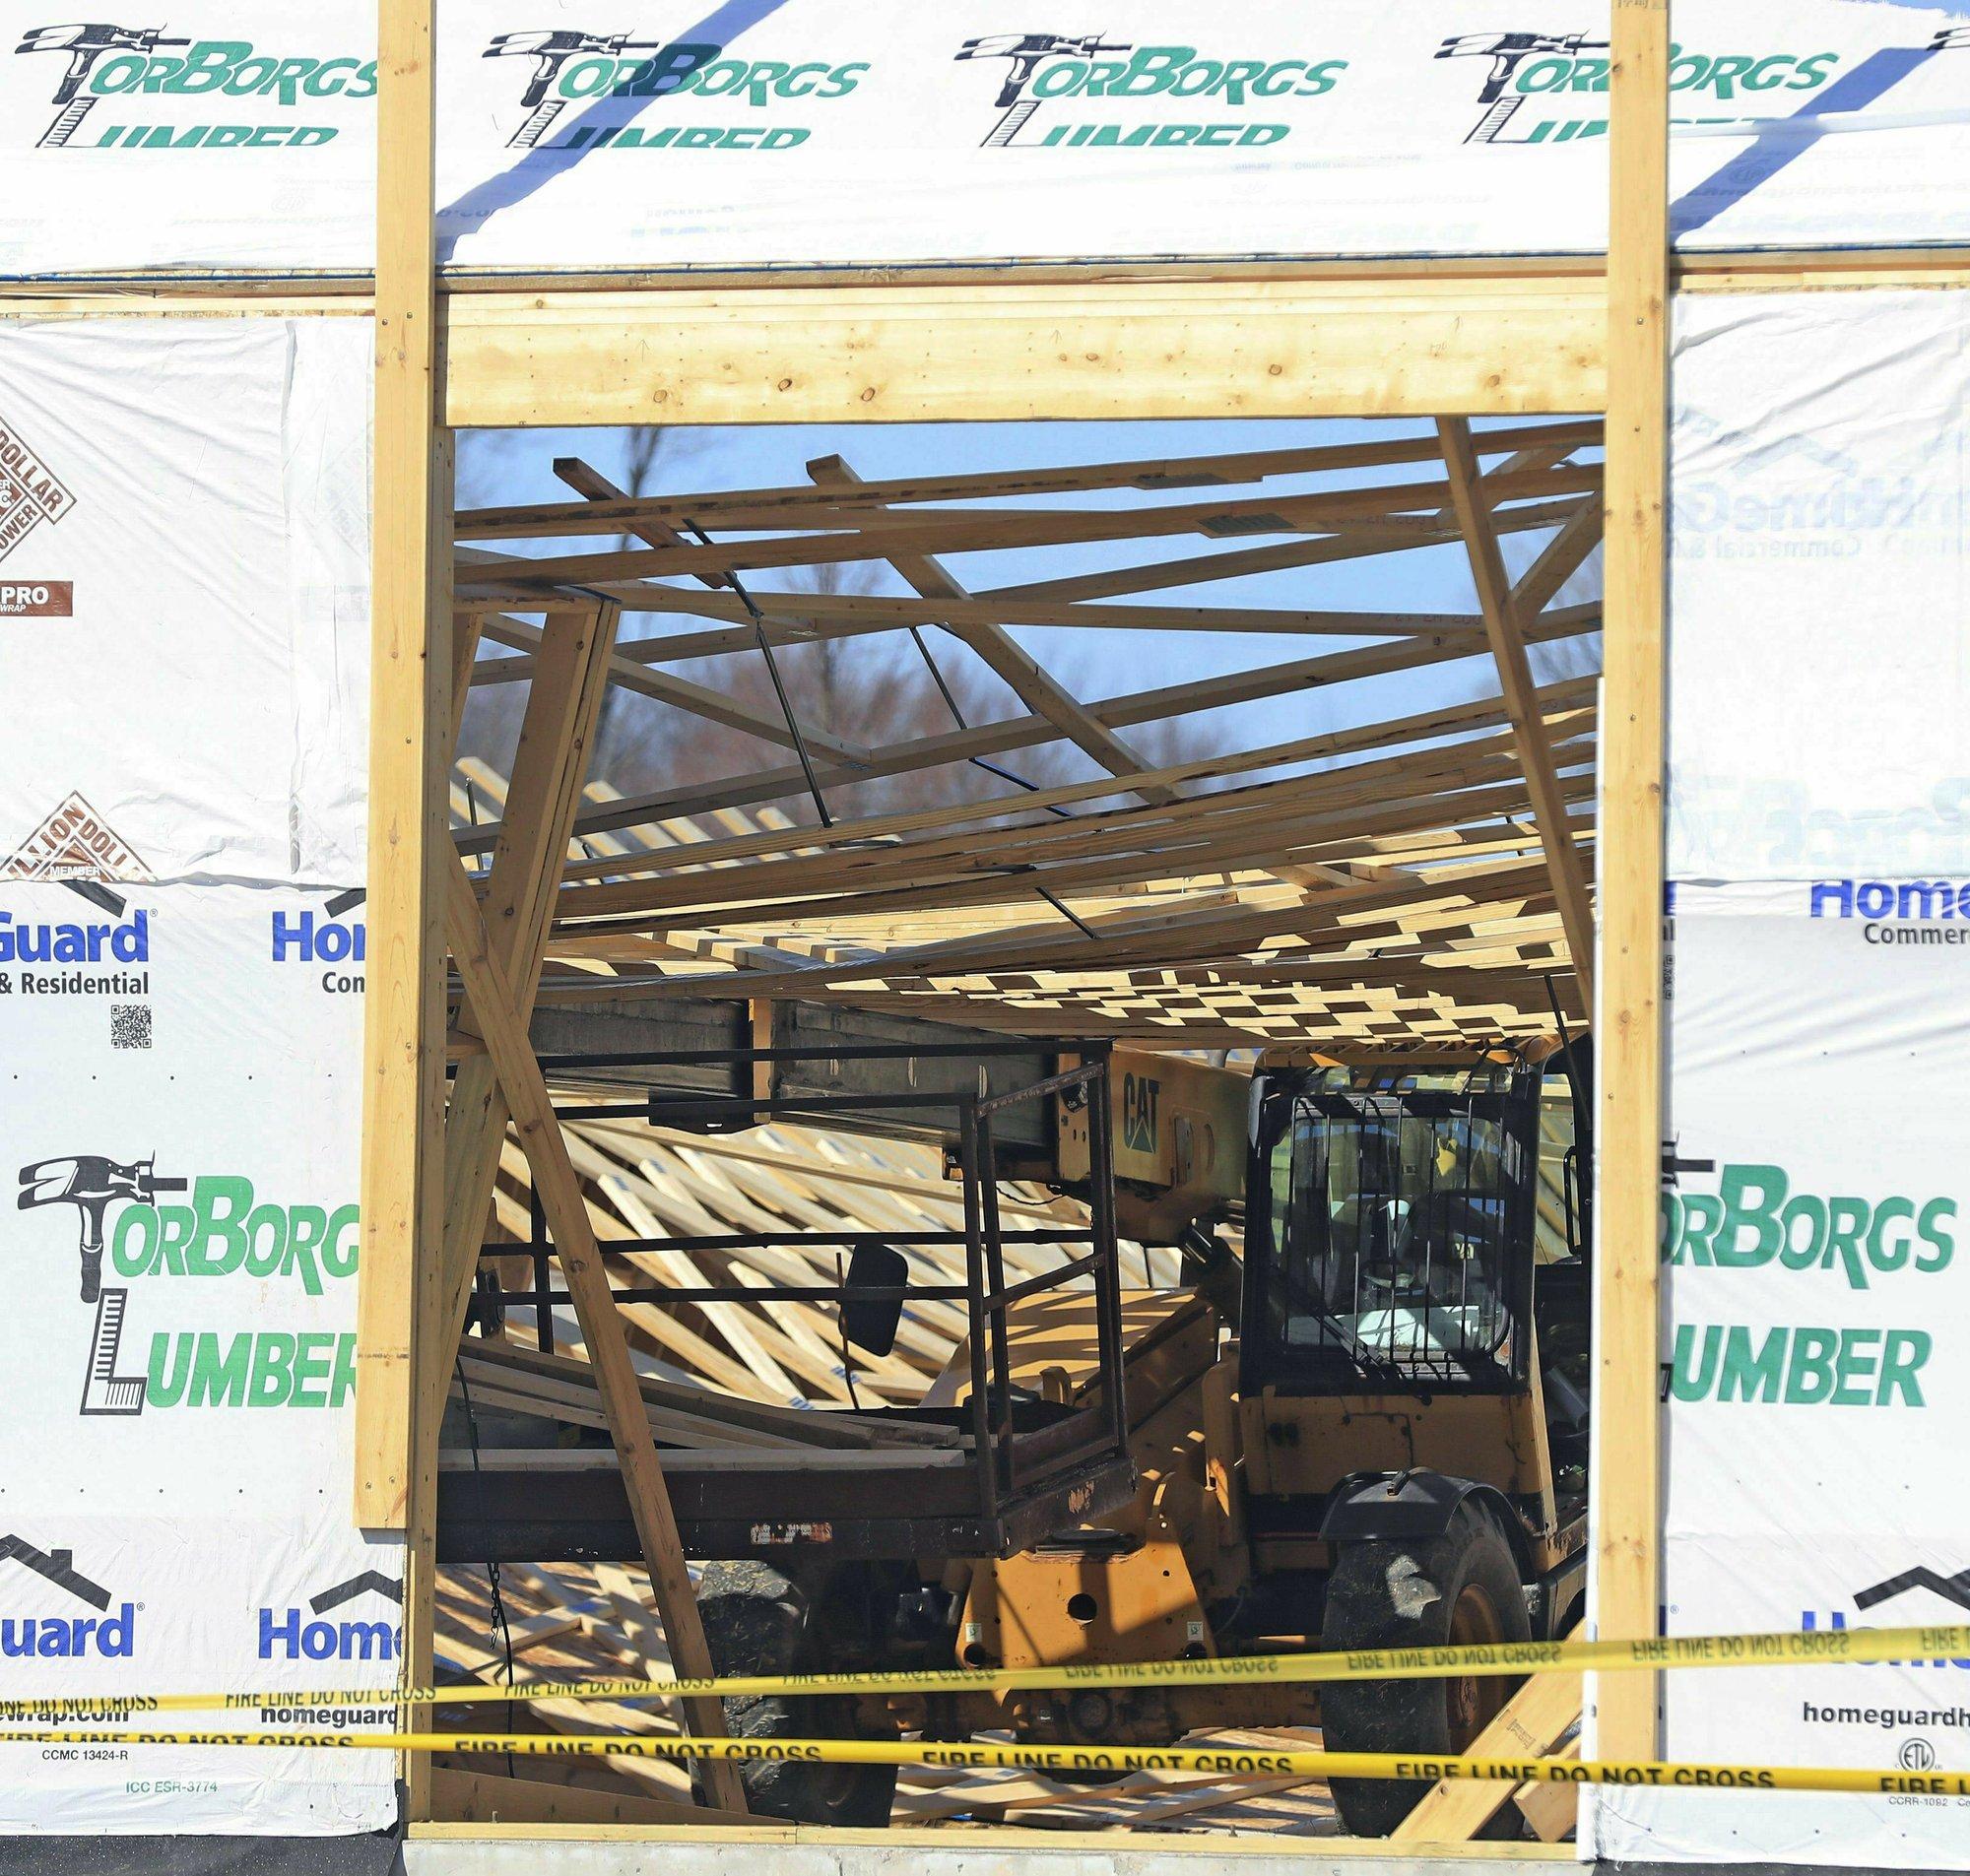 3 workers hurt in building collapse in northeast Wisconsin